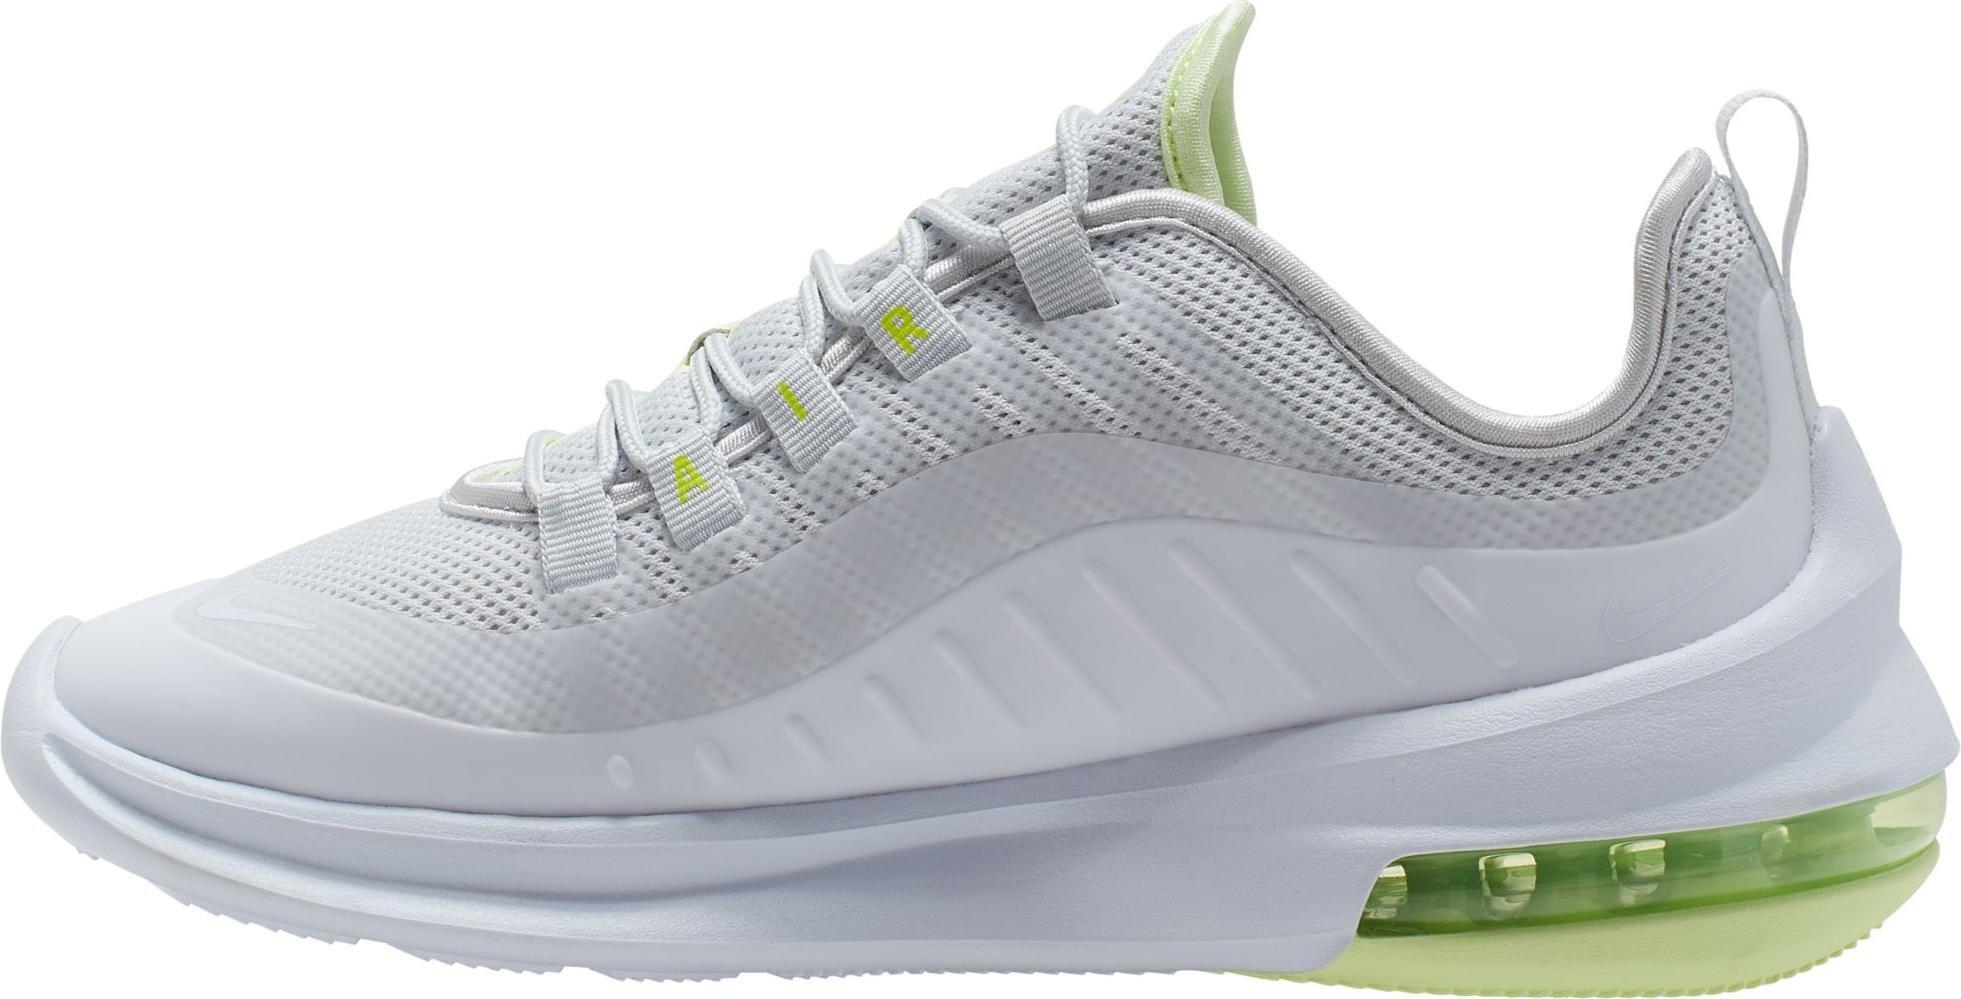 Obuv Nike WMNS AIR MAX AXIS aa2168-014 Veľkosť 40,5 EU | 6,5 UK | 9 US | 26 CM